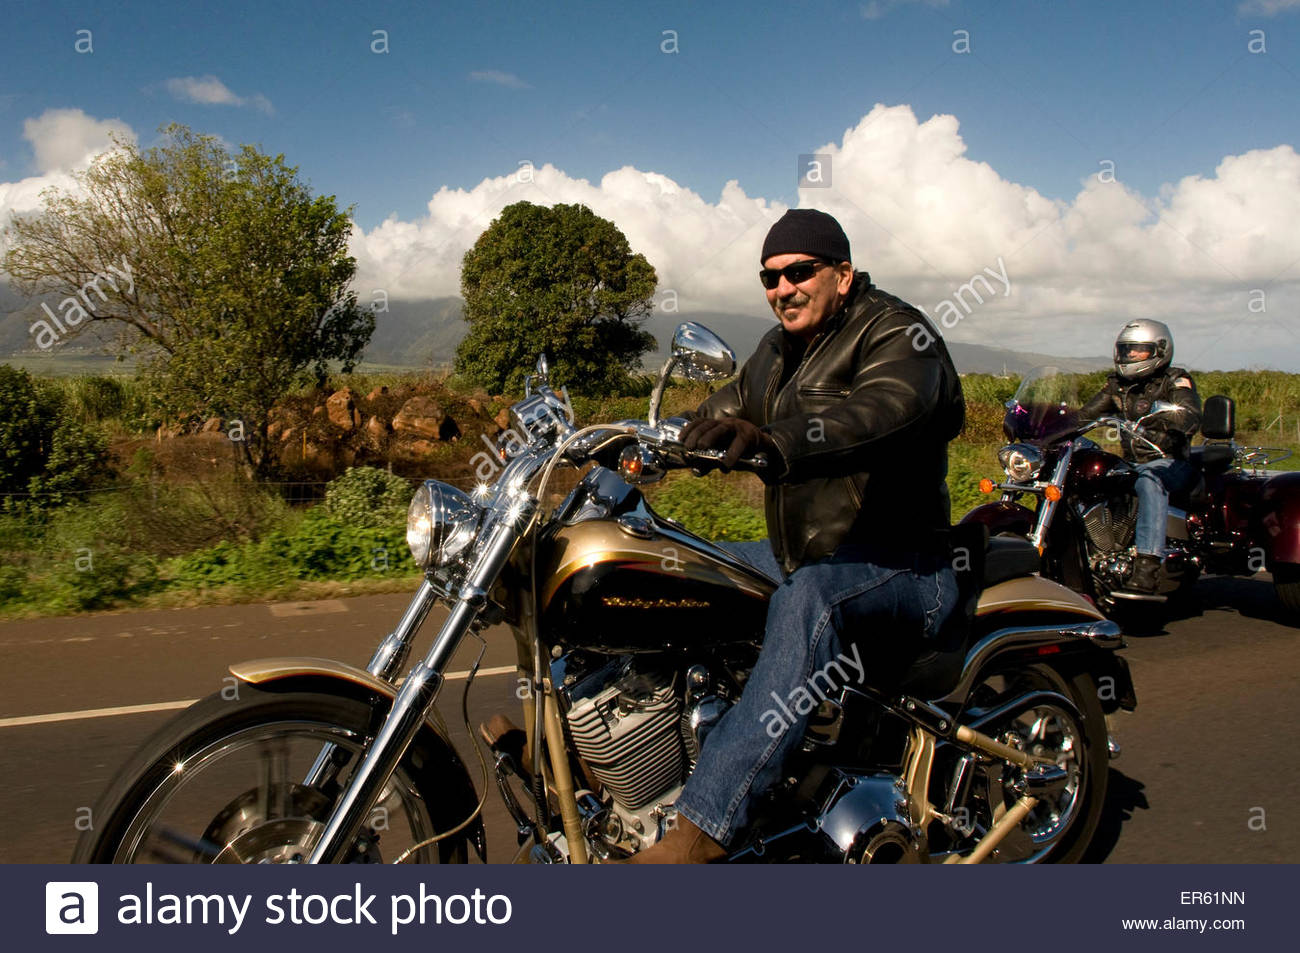 Harley Davidson Bikers on the Road between Kahului and Kihei. Maui. Hawaii. - Stock Image